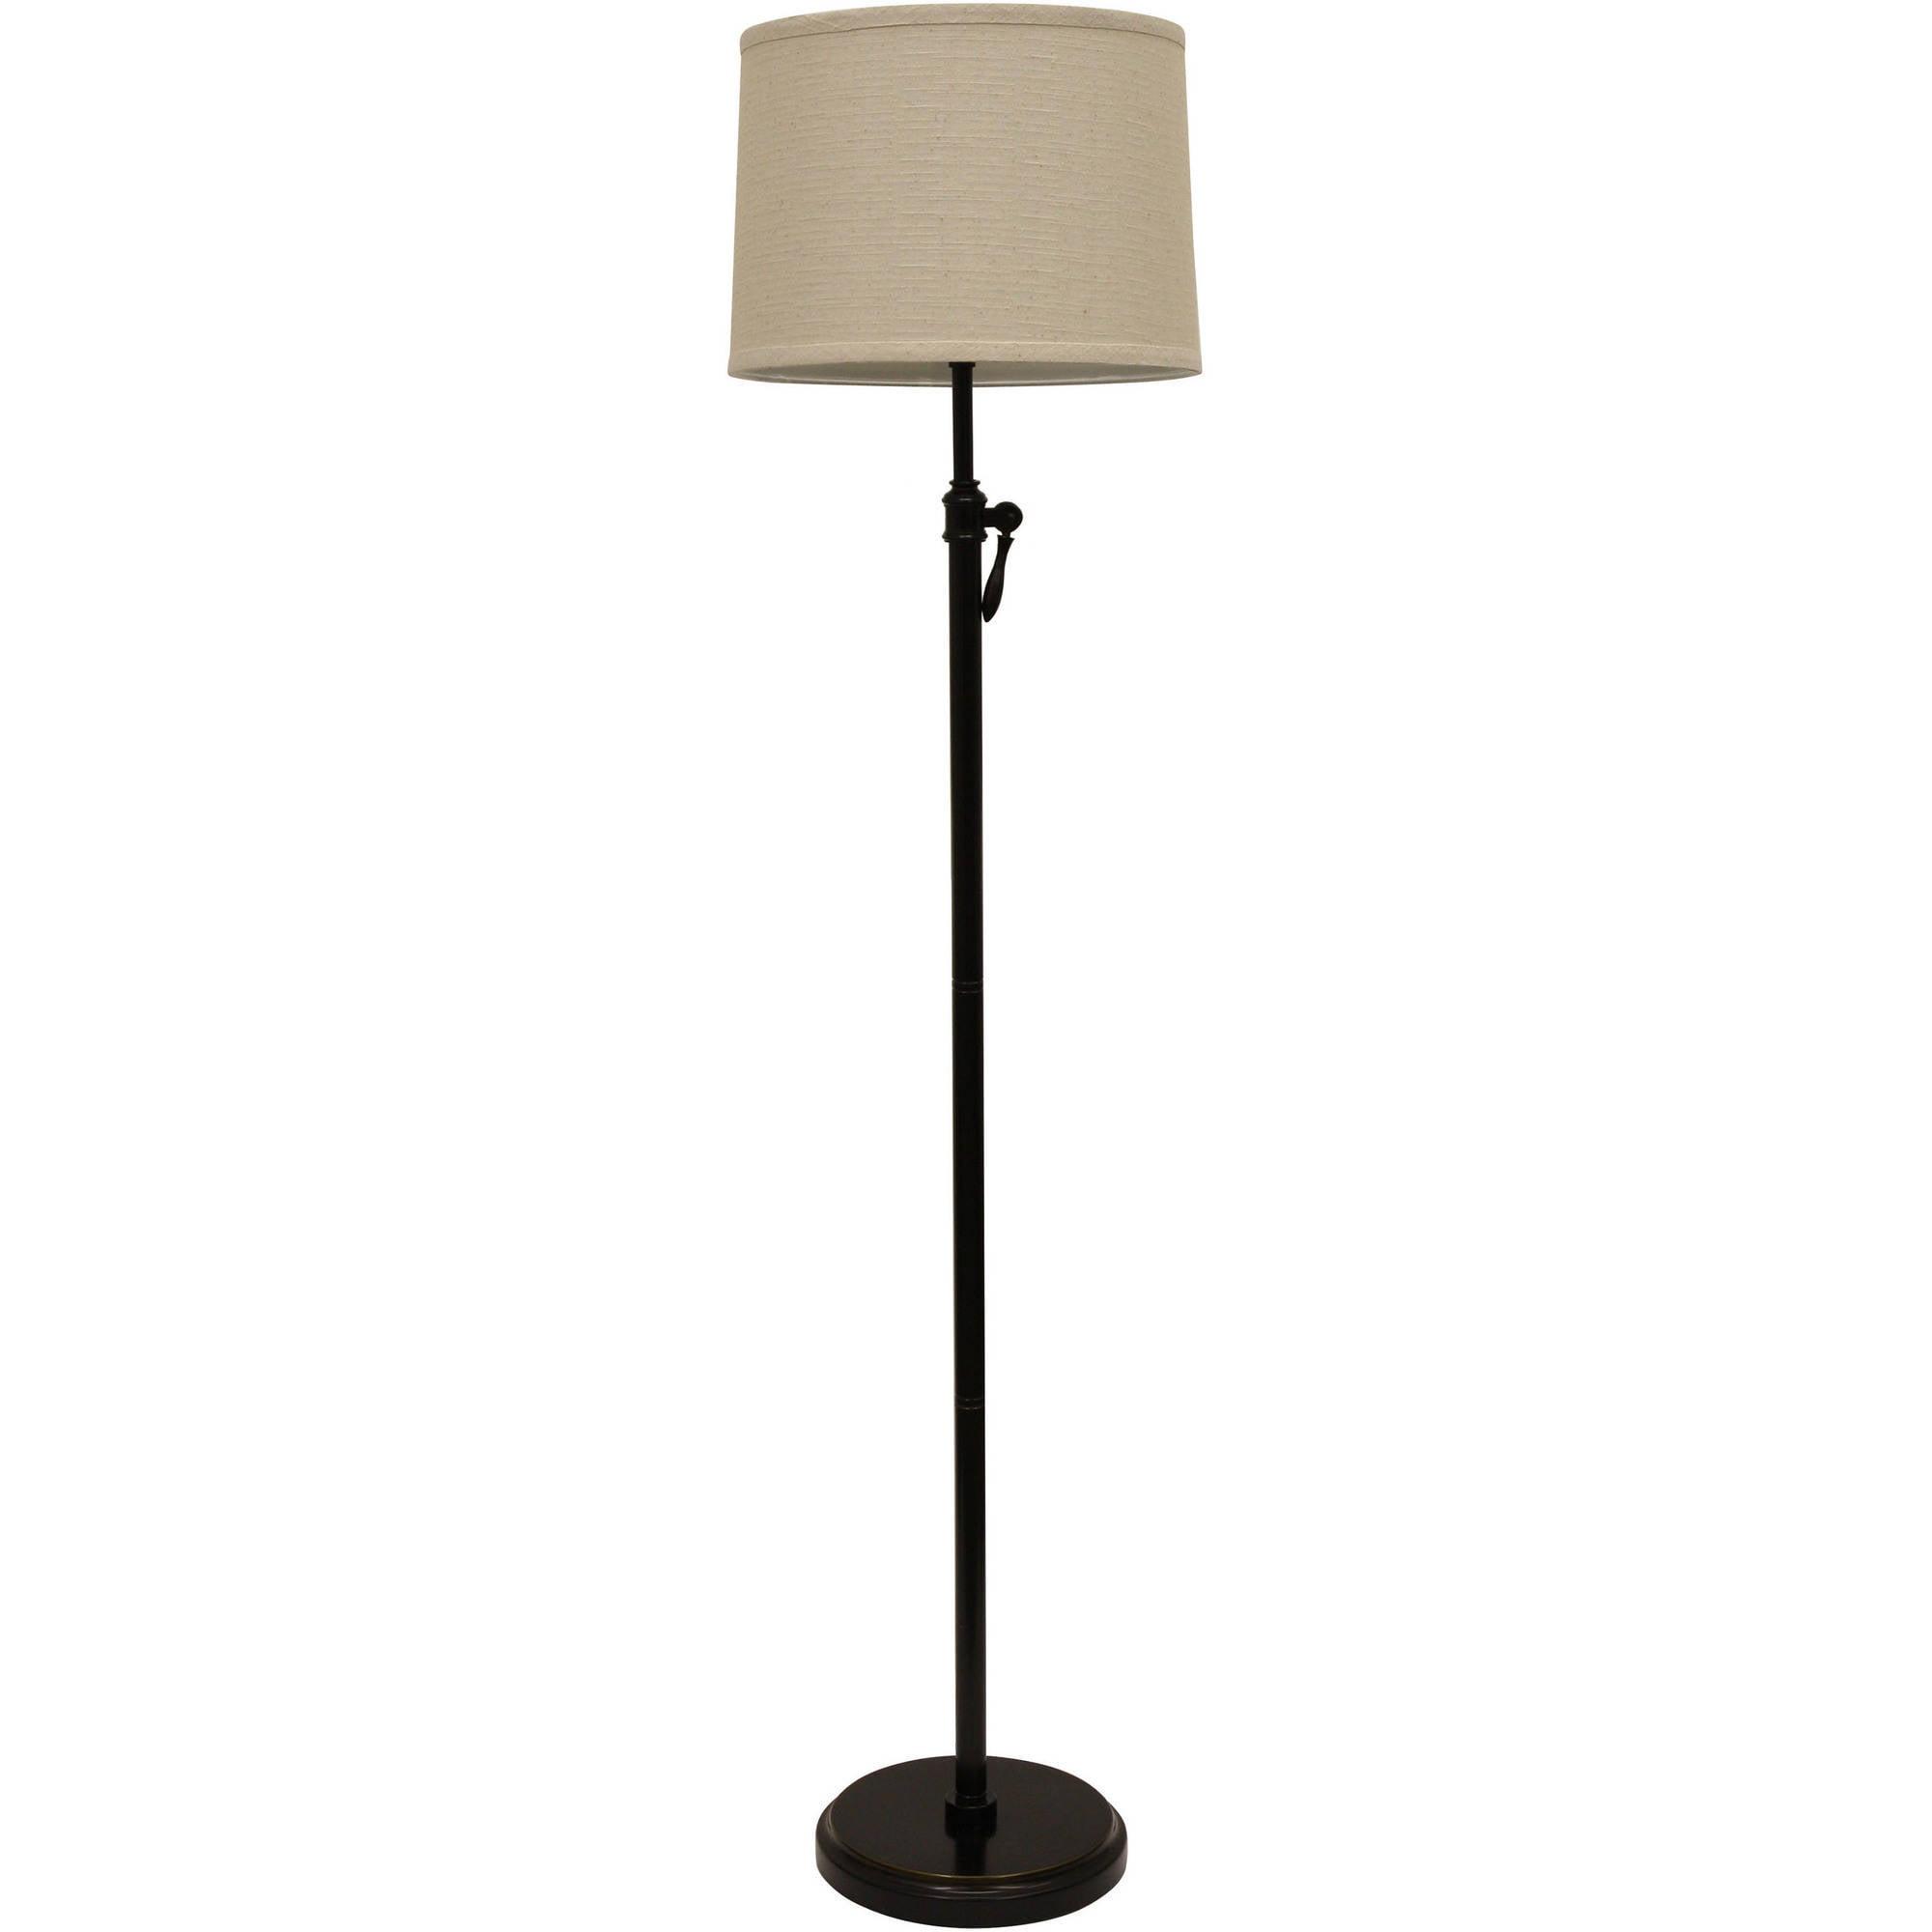 Adjustable Floor Lamp by JIMCO LAMP CO.